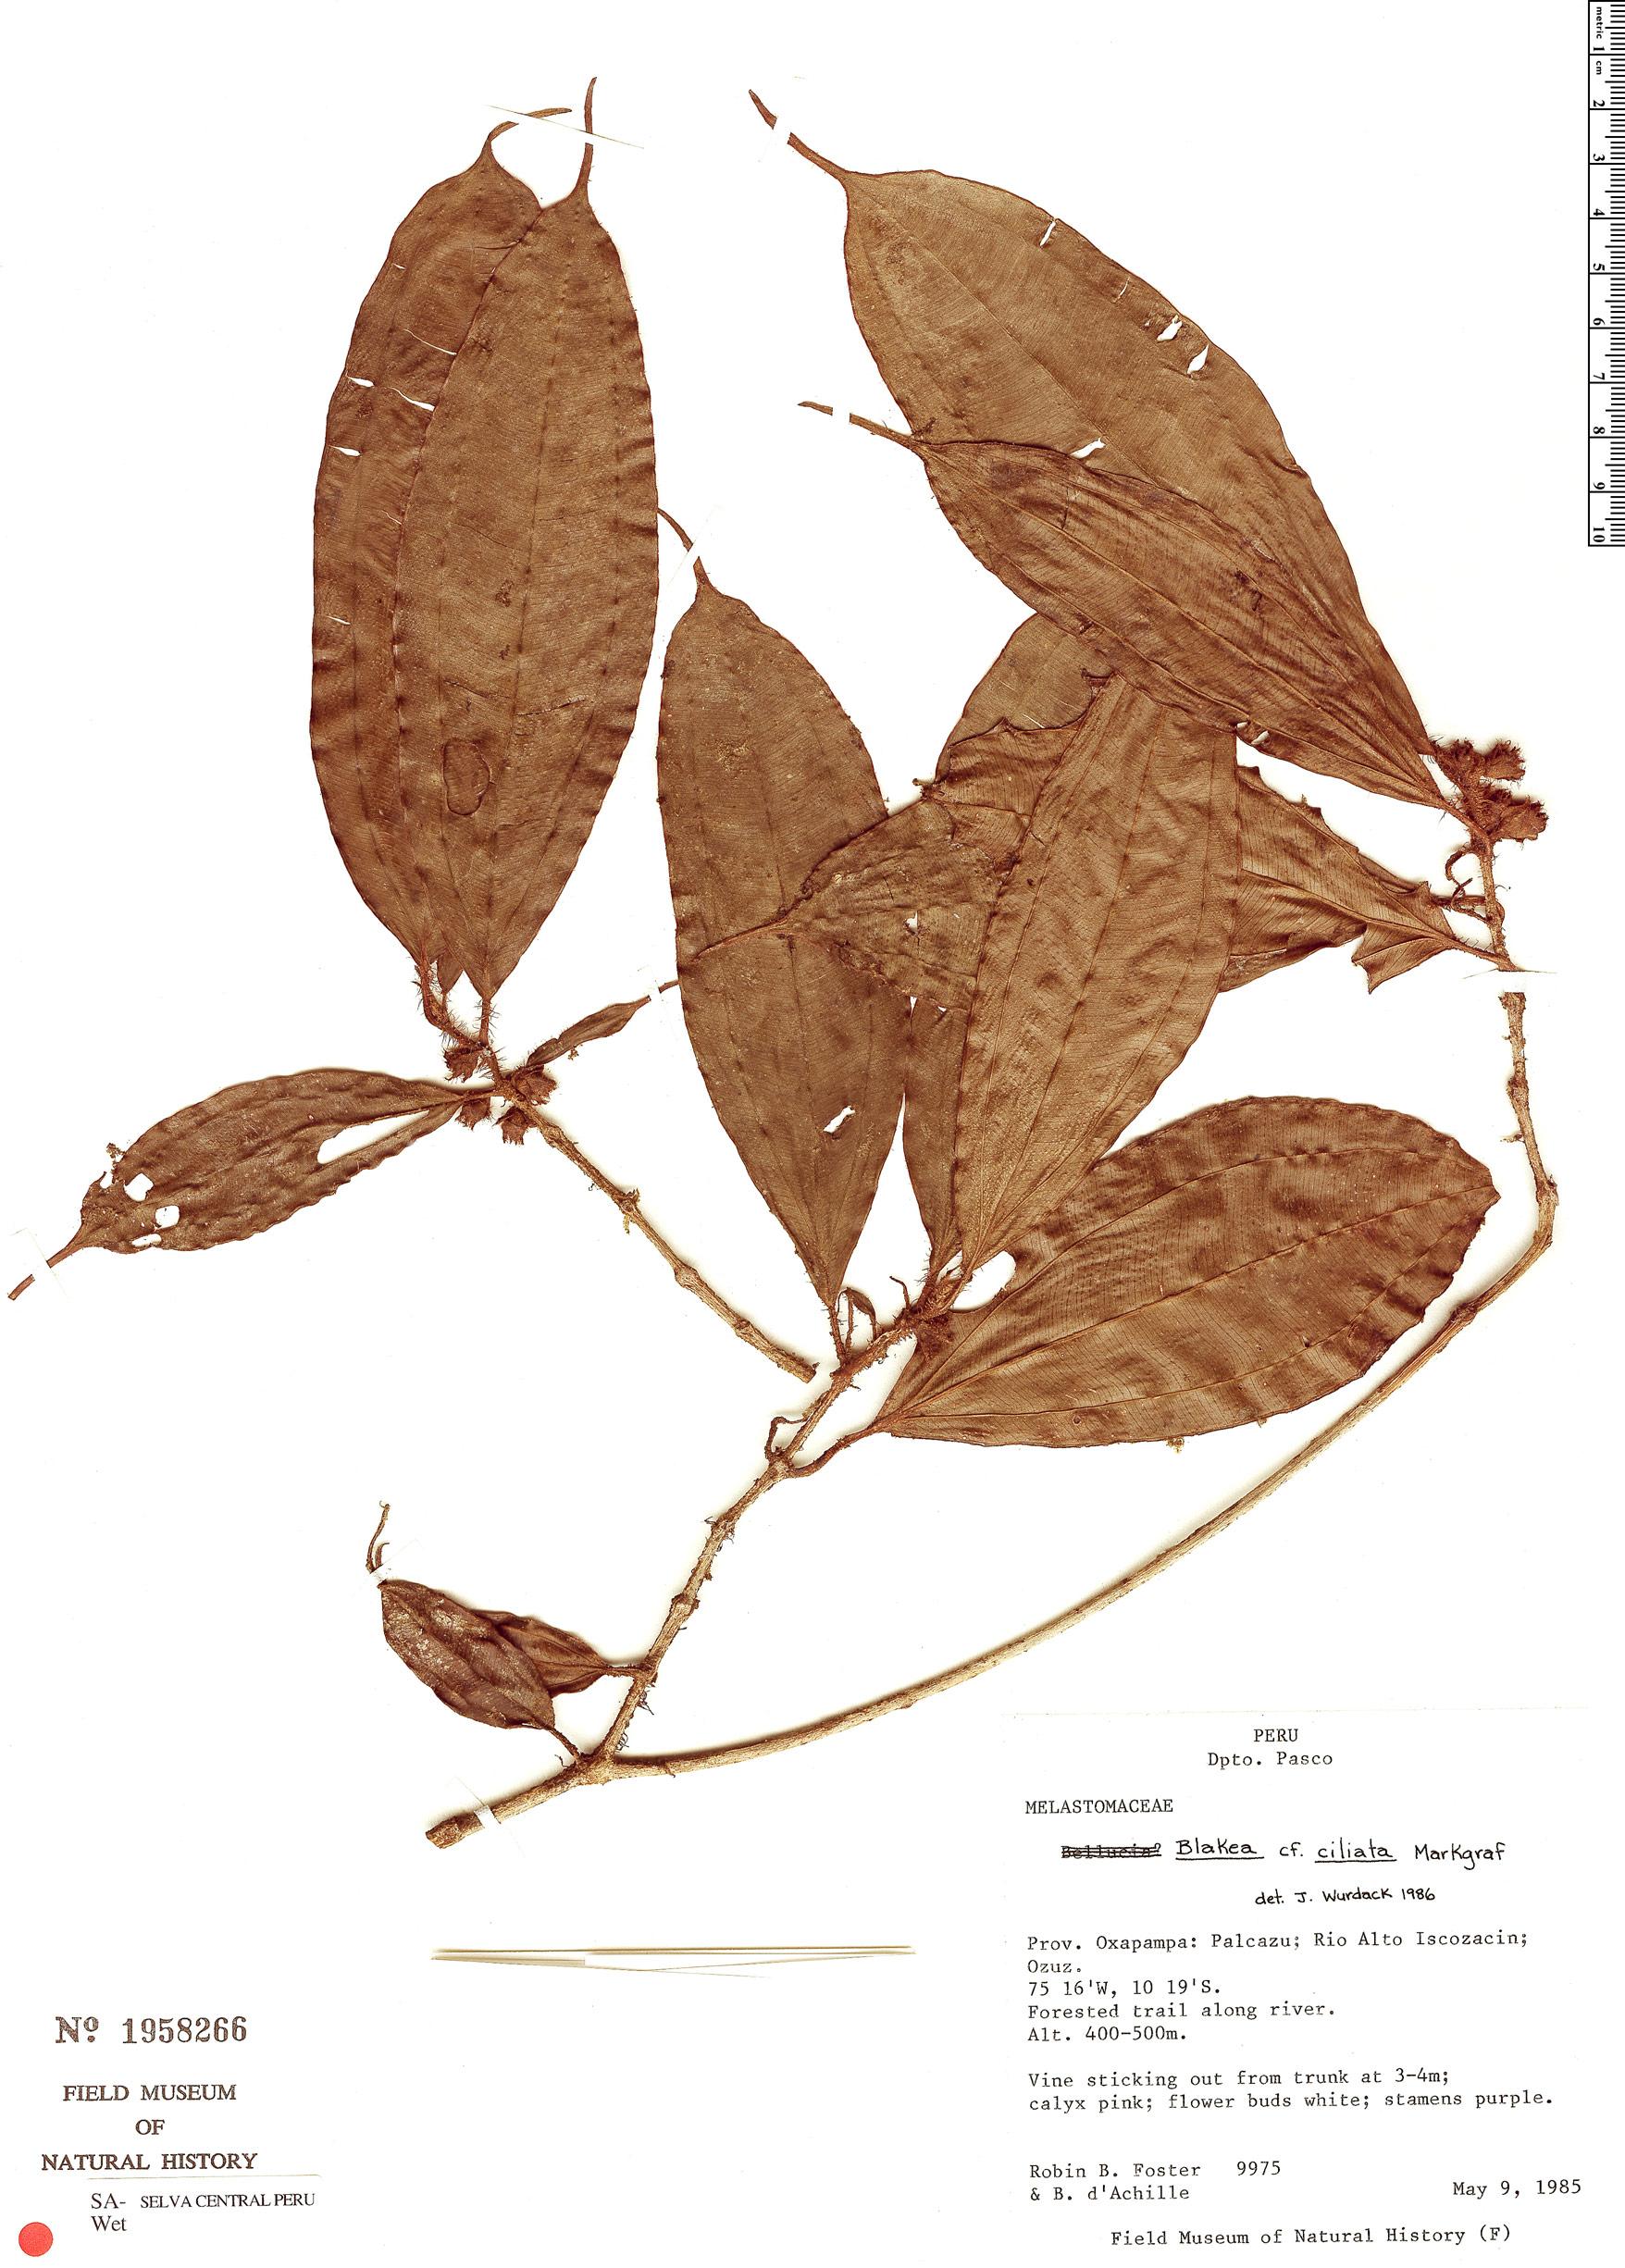 Specimen: Blakea ciliata